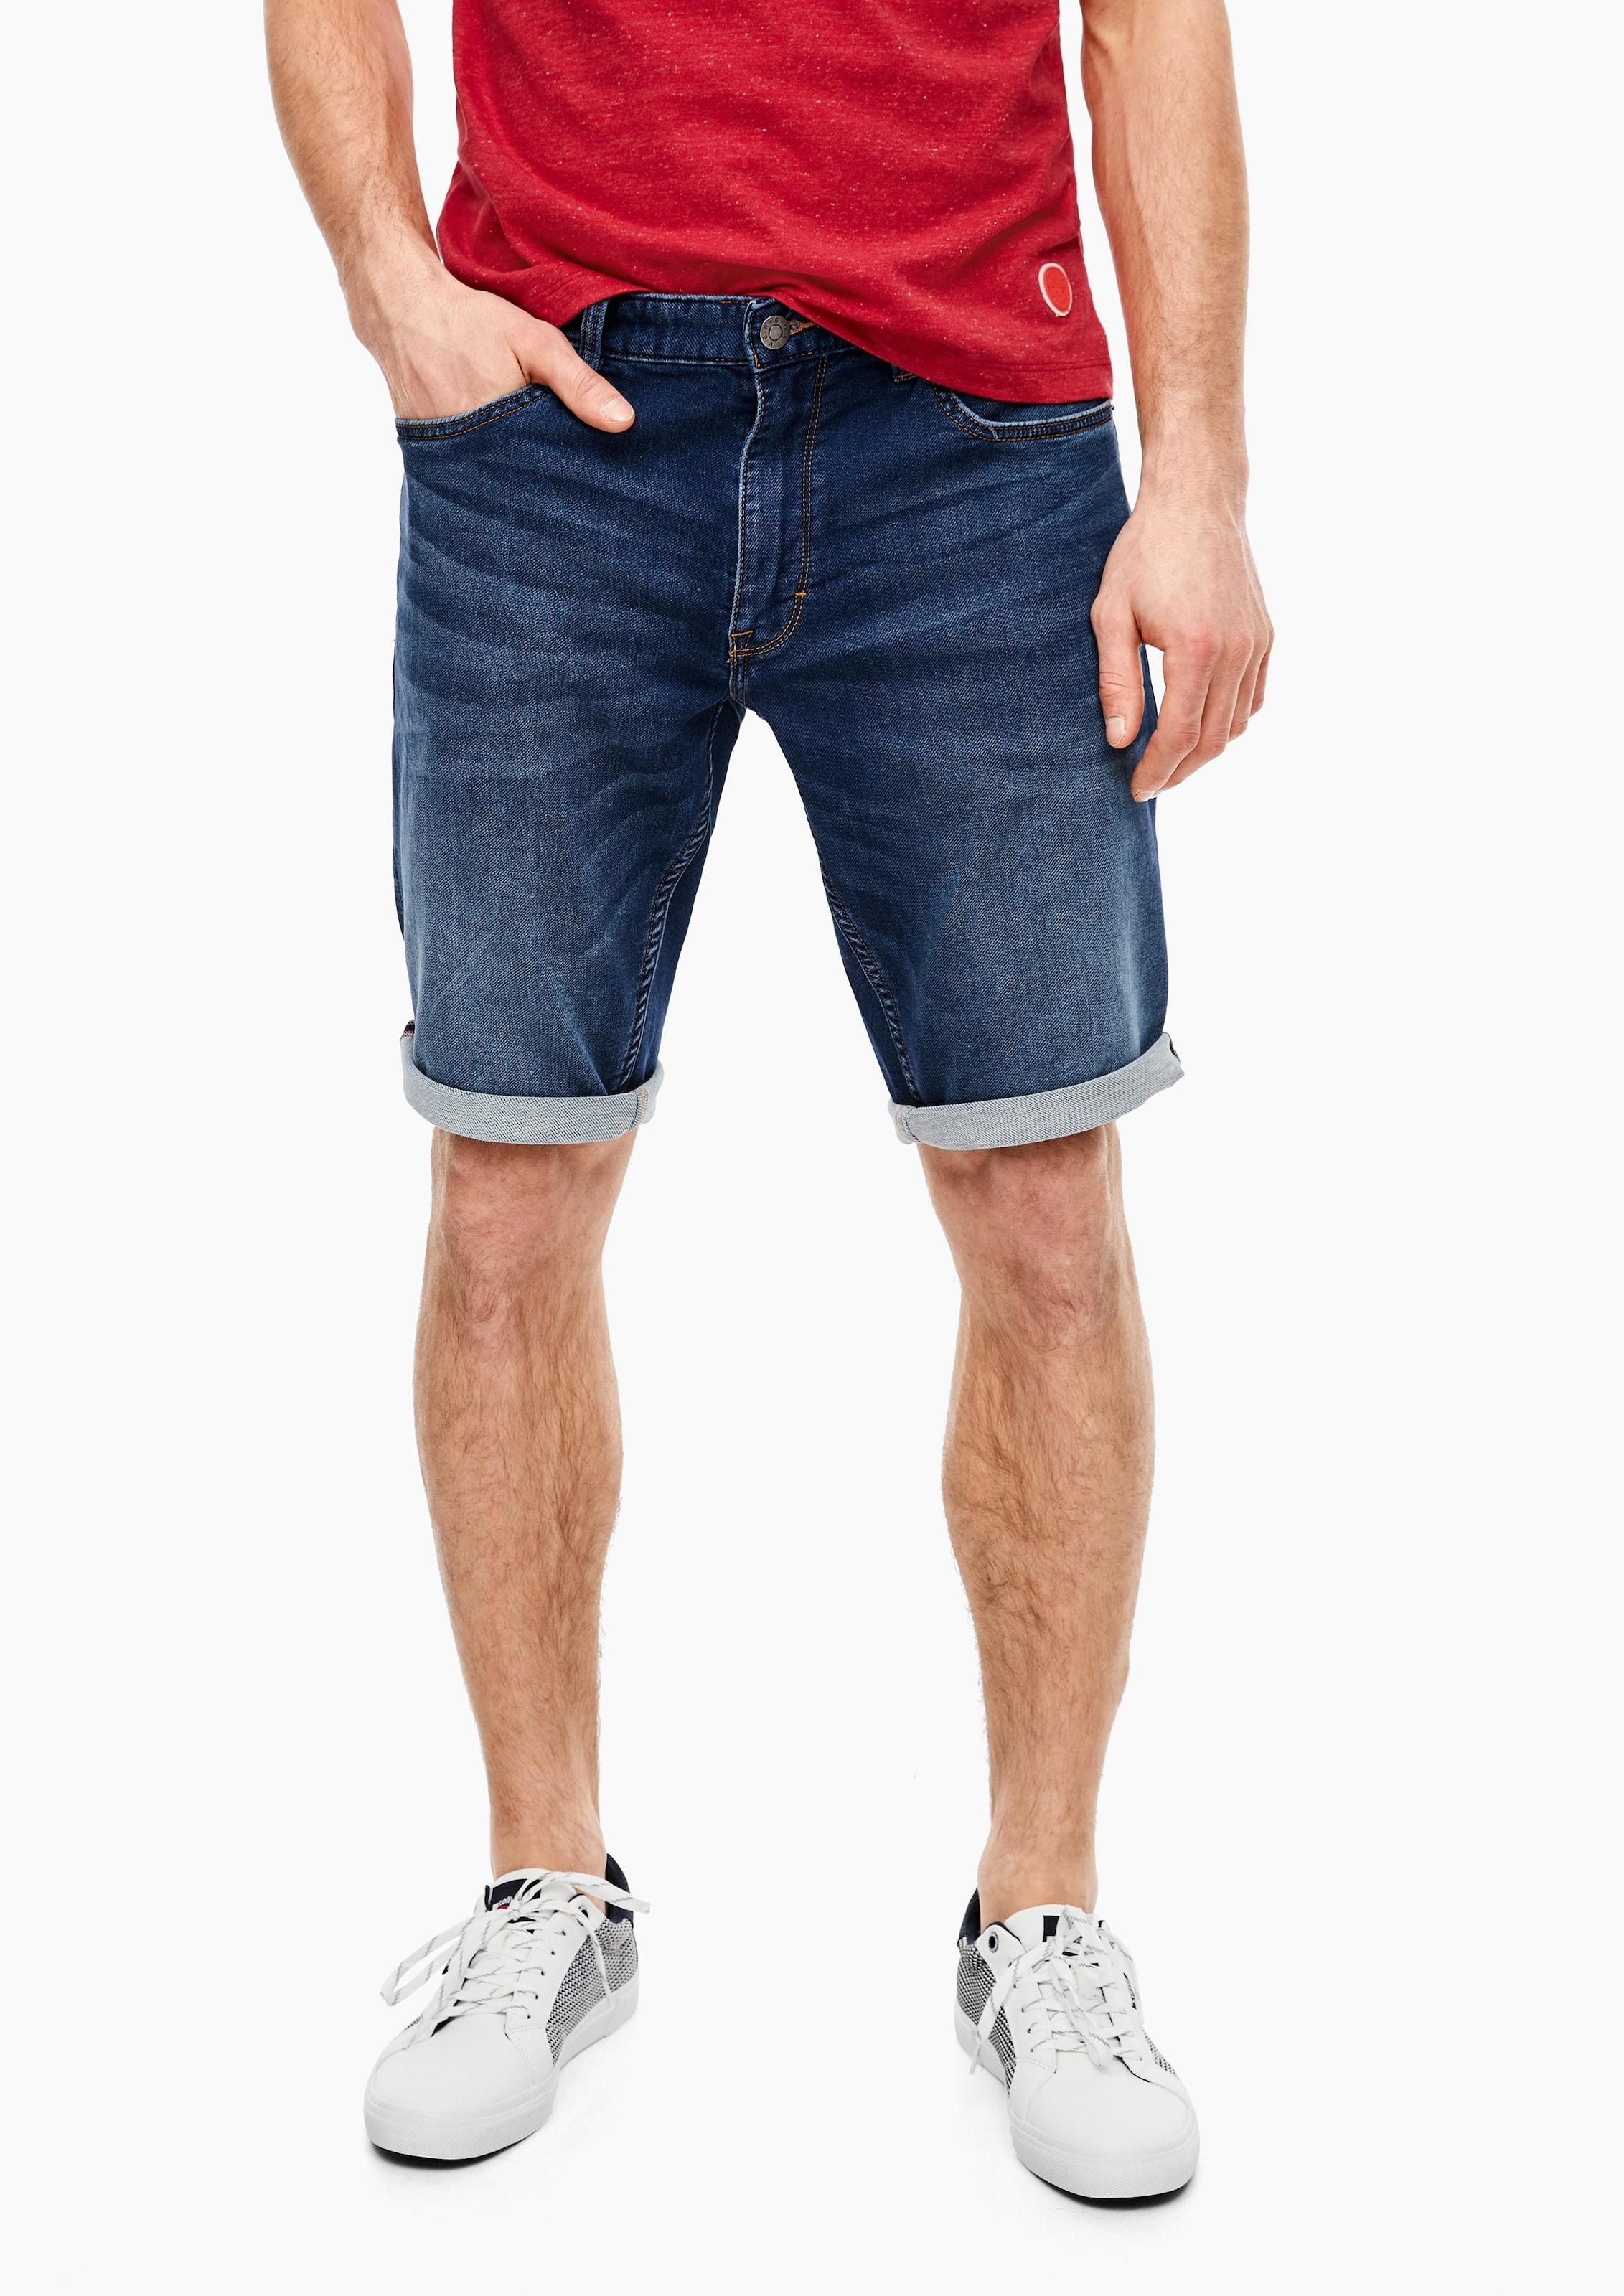 s.Oliver Shorts in blue denim Jeans 03.899.72.6202.58Z4.29